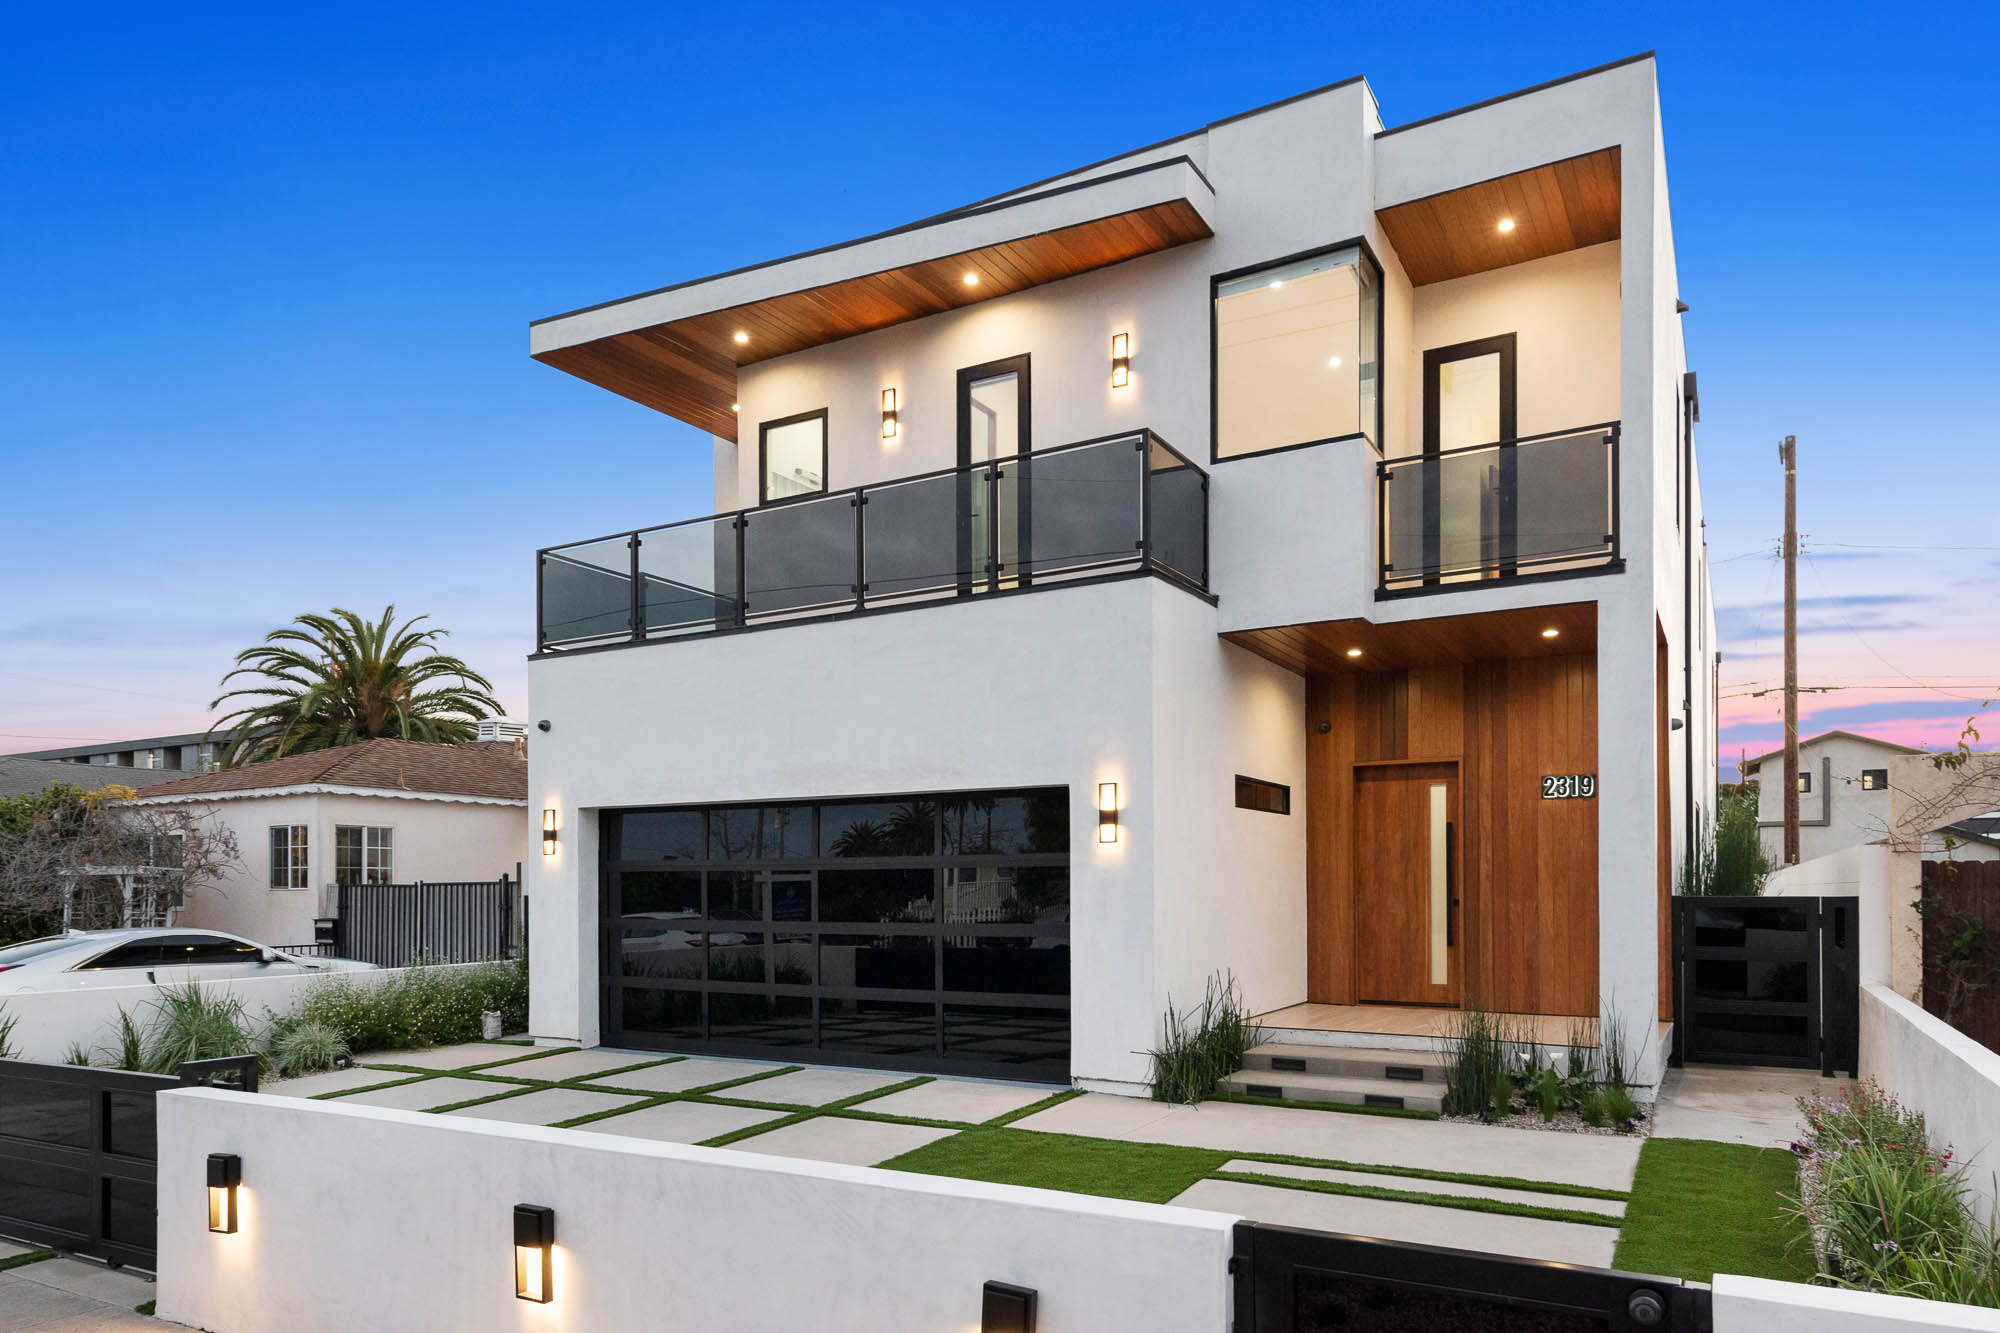 2319 Penmar Ave, Venice, CA, 90291 - Home for Sale